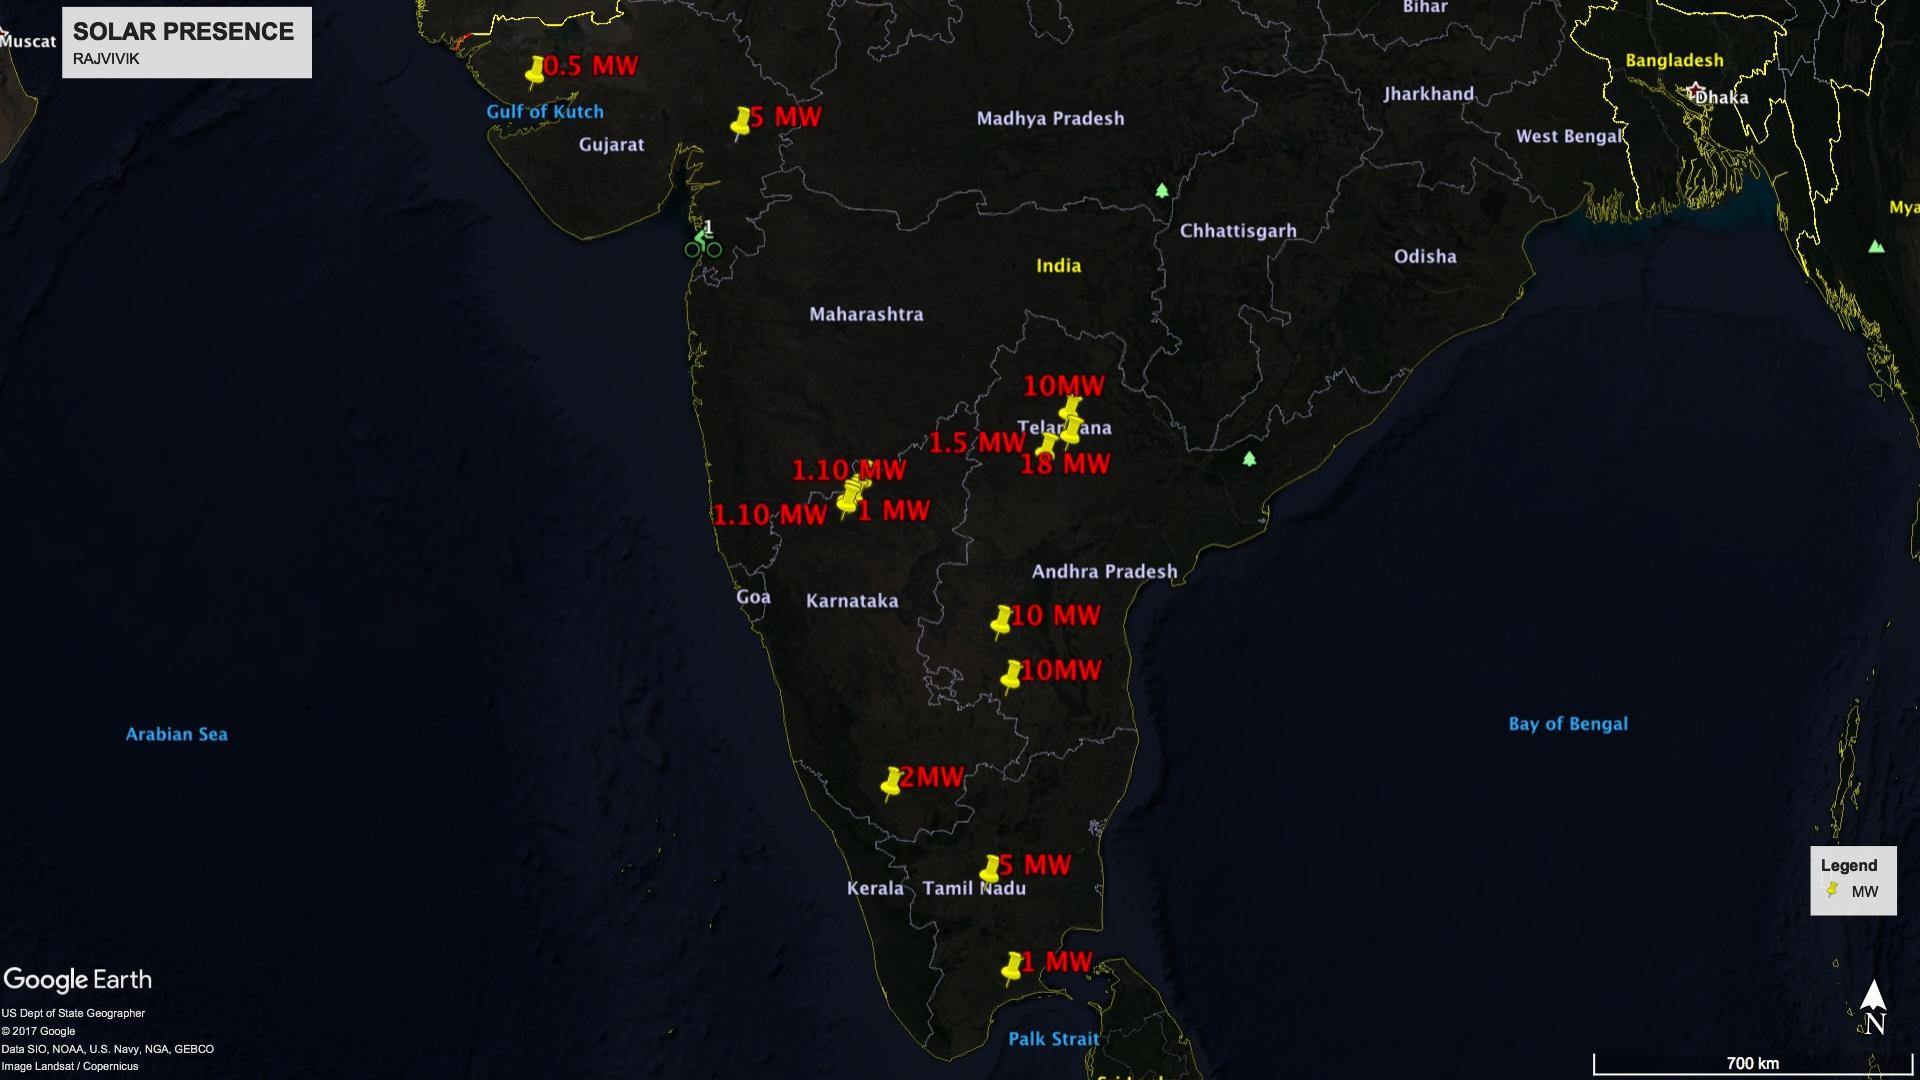 Solar presence map hd.jpg